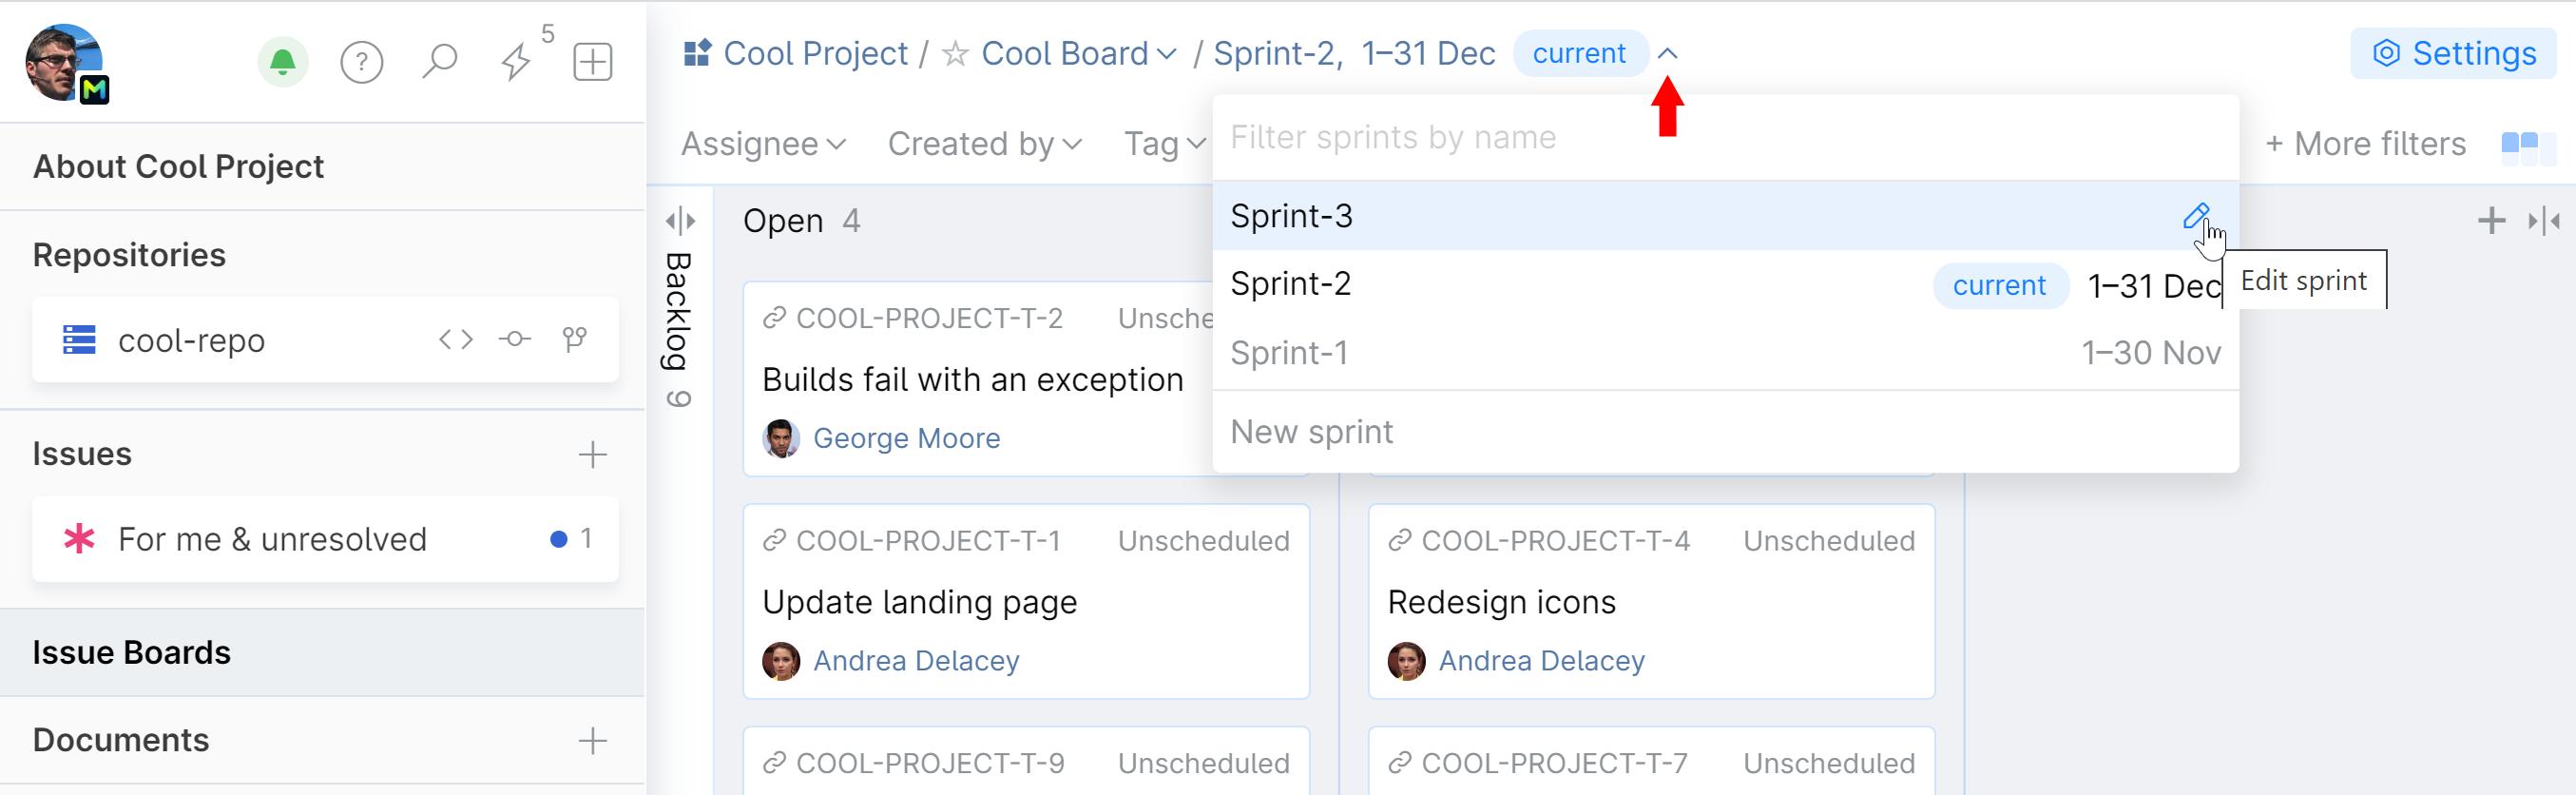 editSprint.png